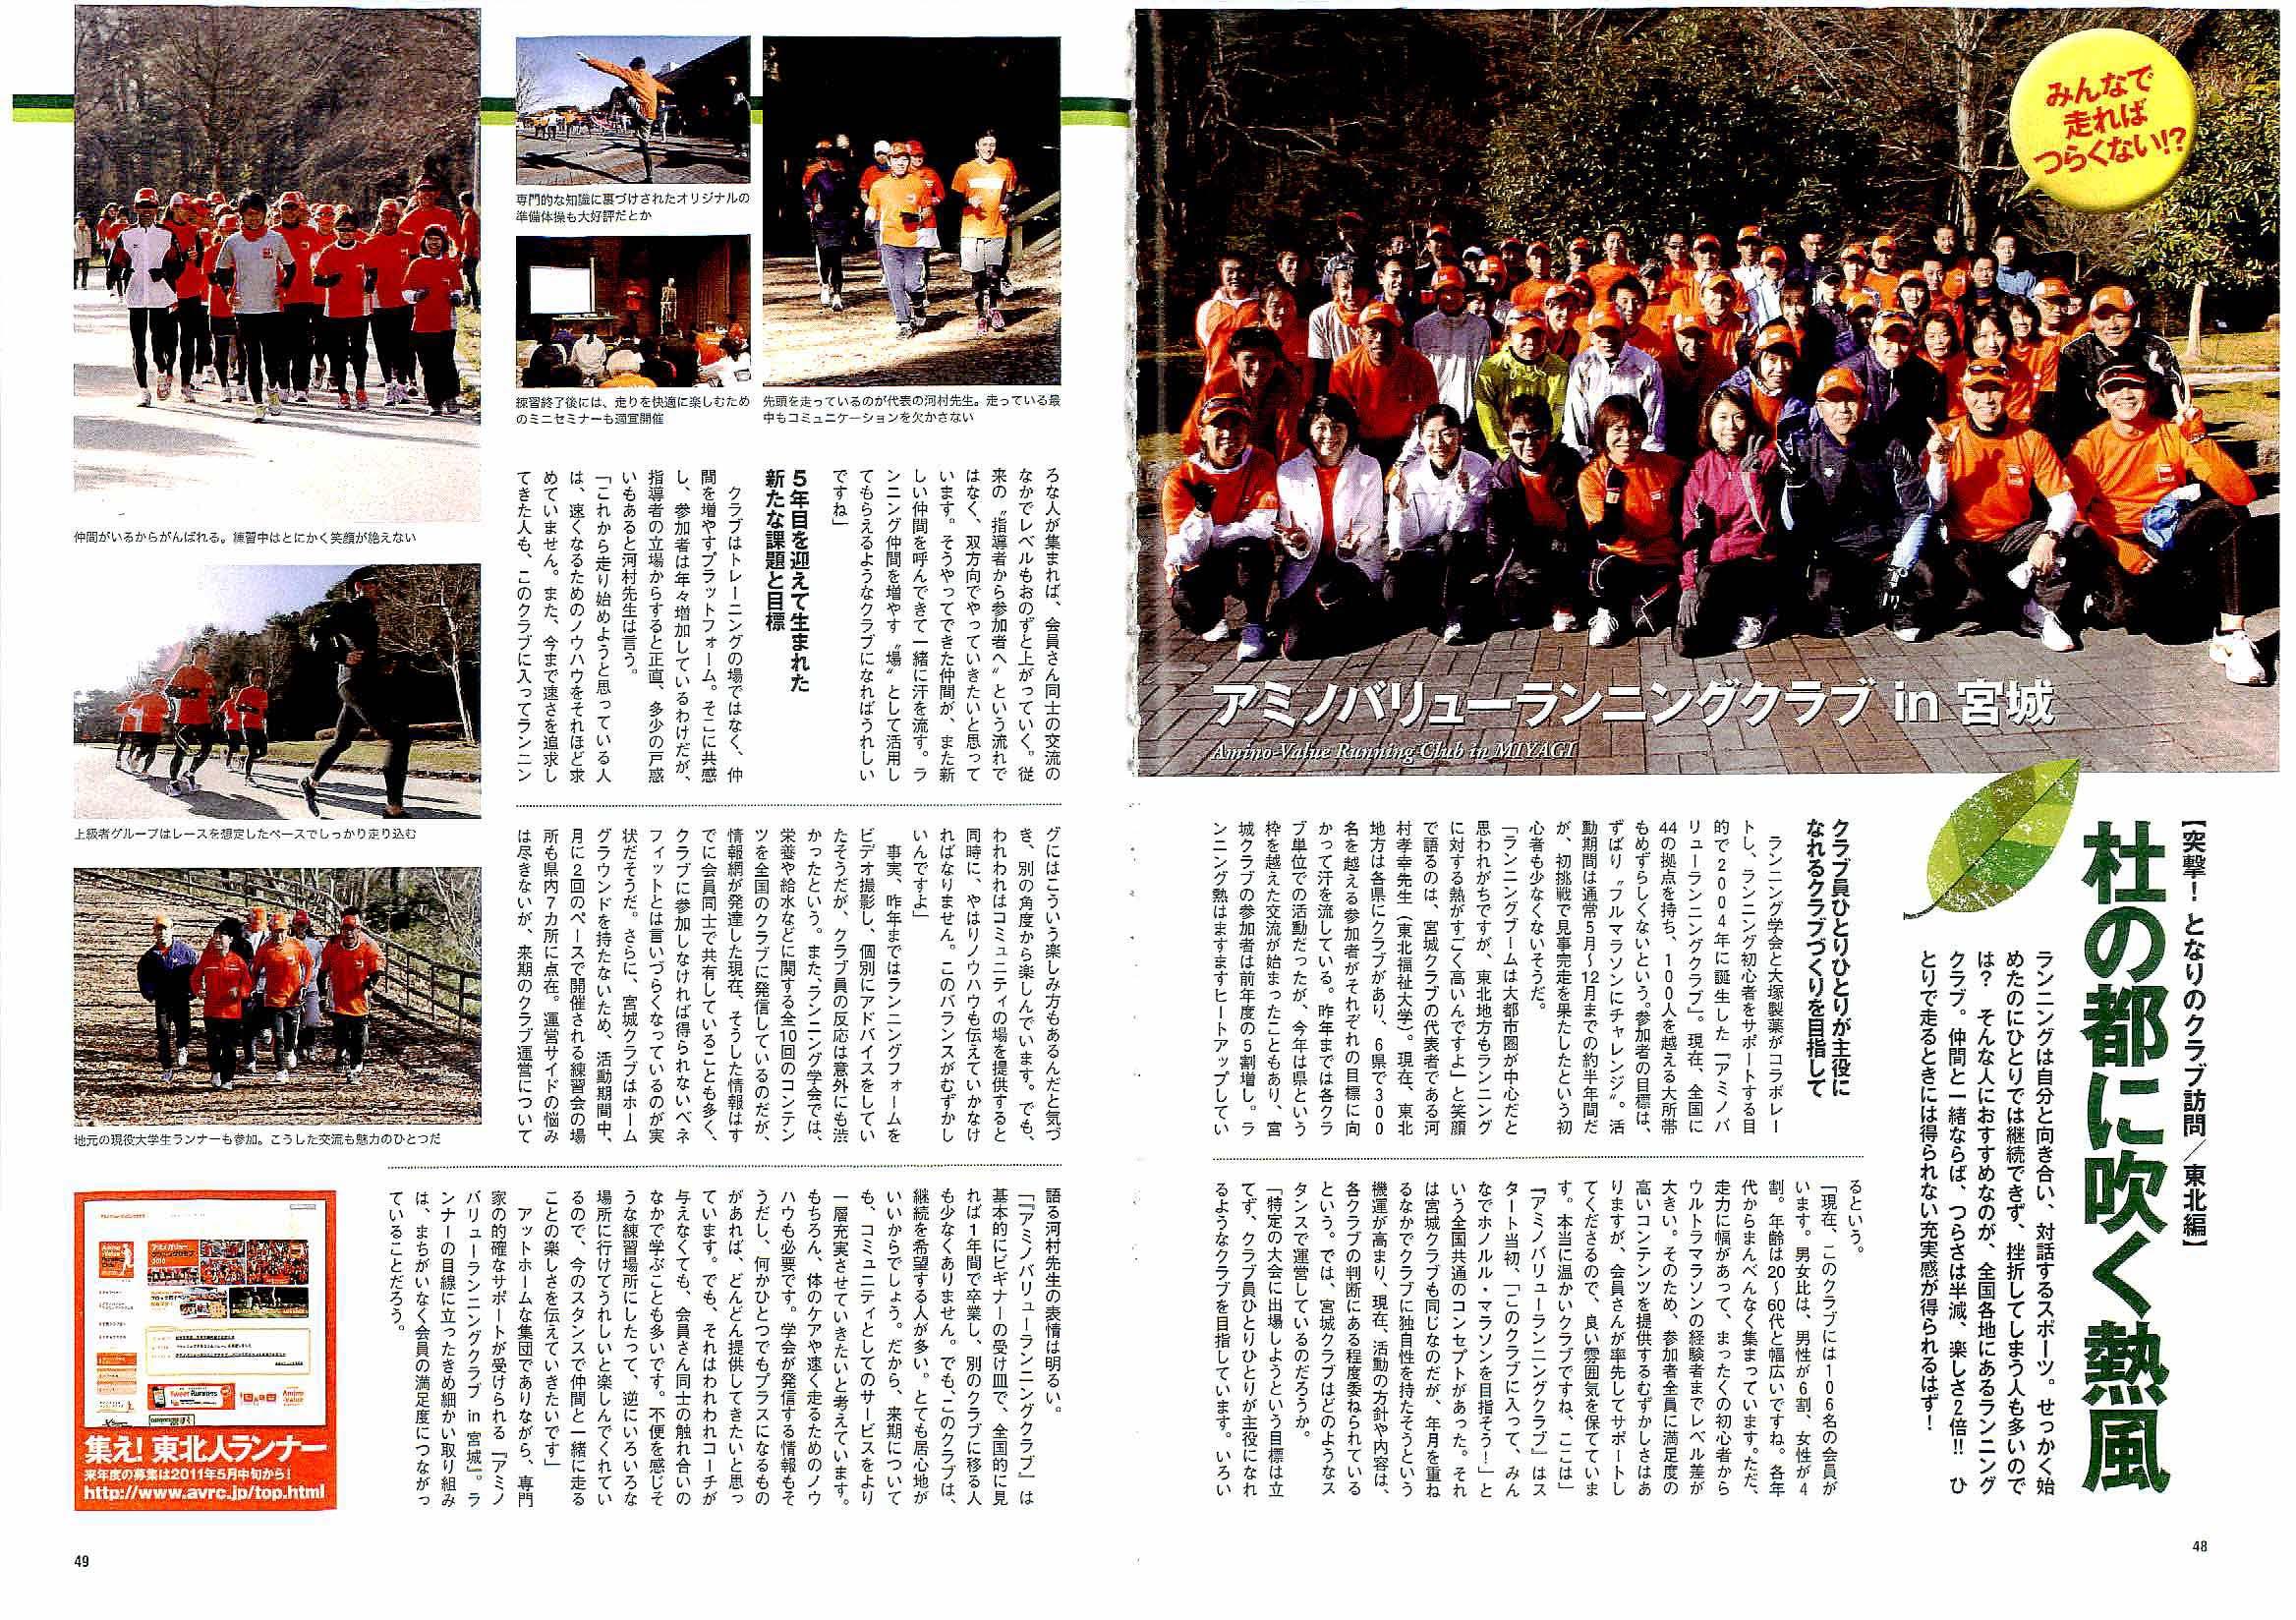 amino2010paper.jpg